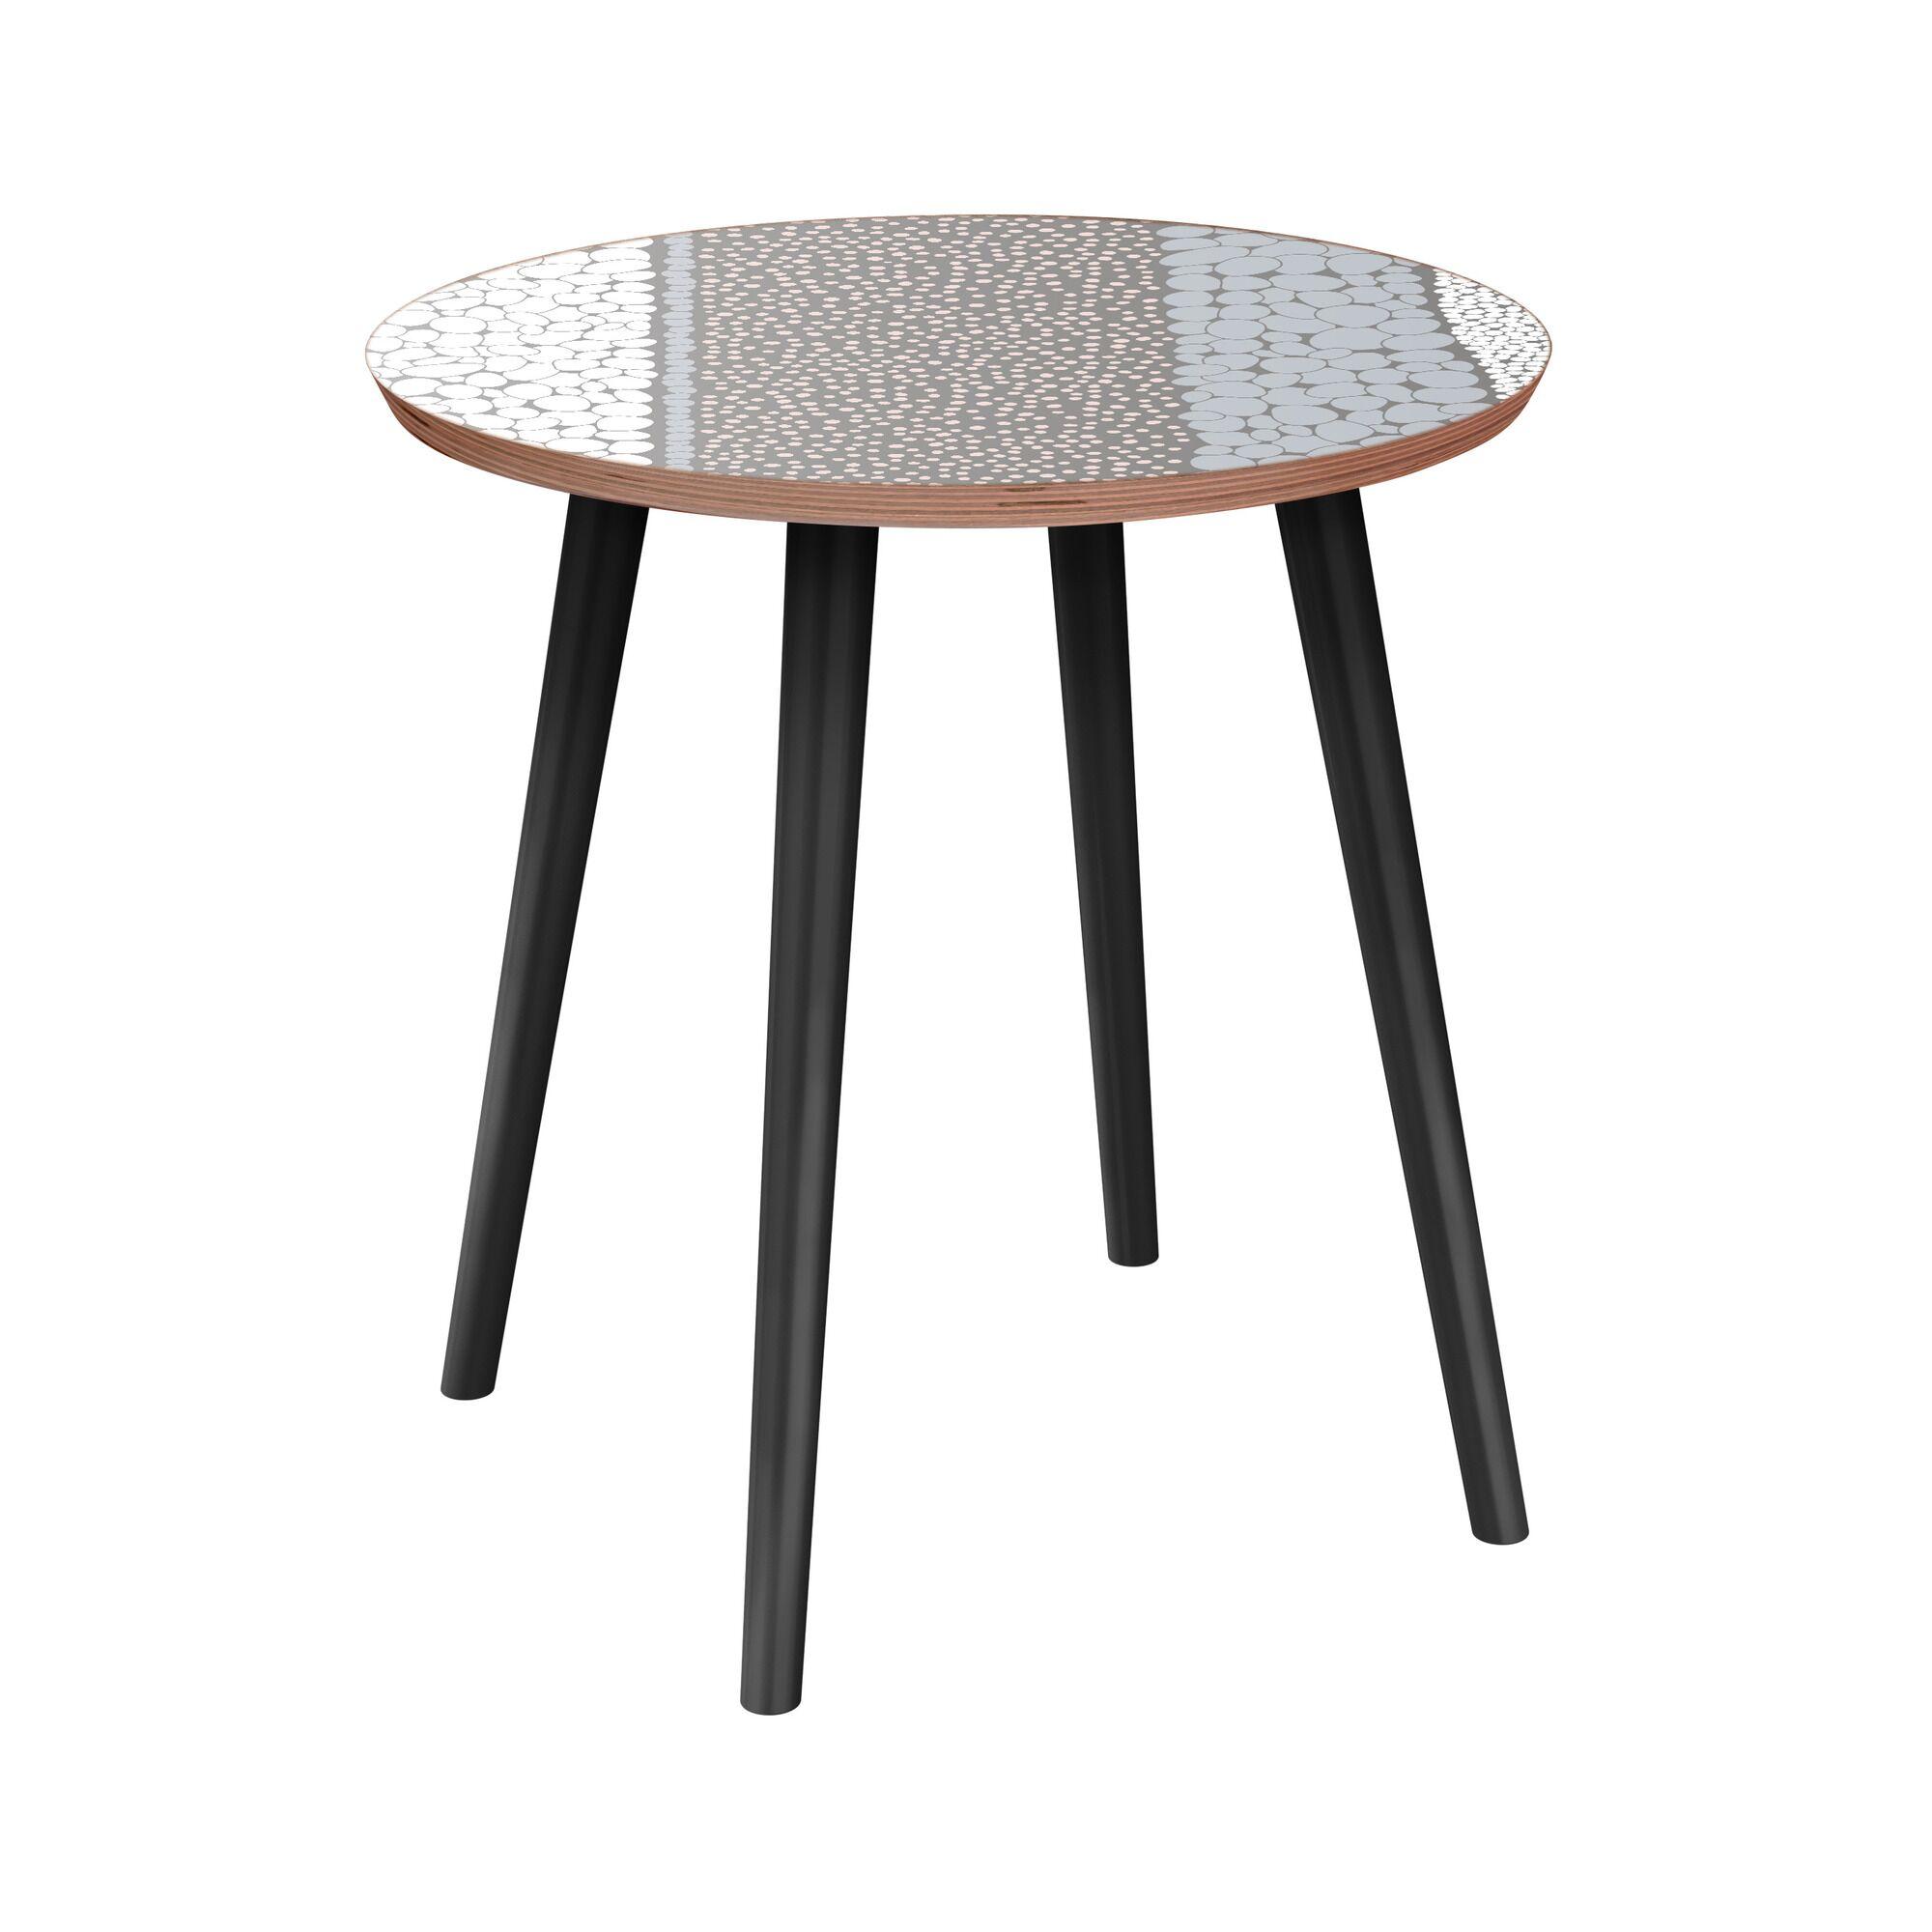 Galaviz End Table Table Base Color: Black, Table Top Color: Walnut